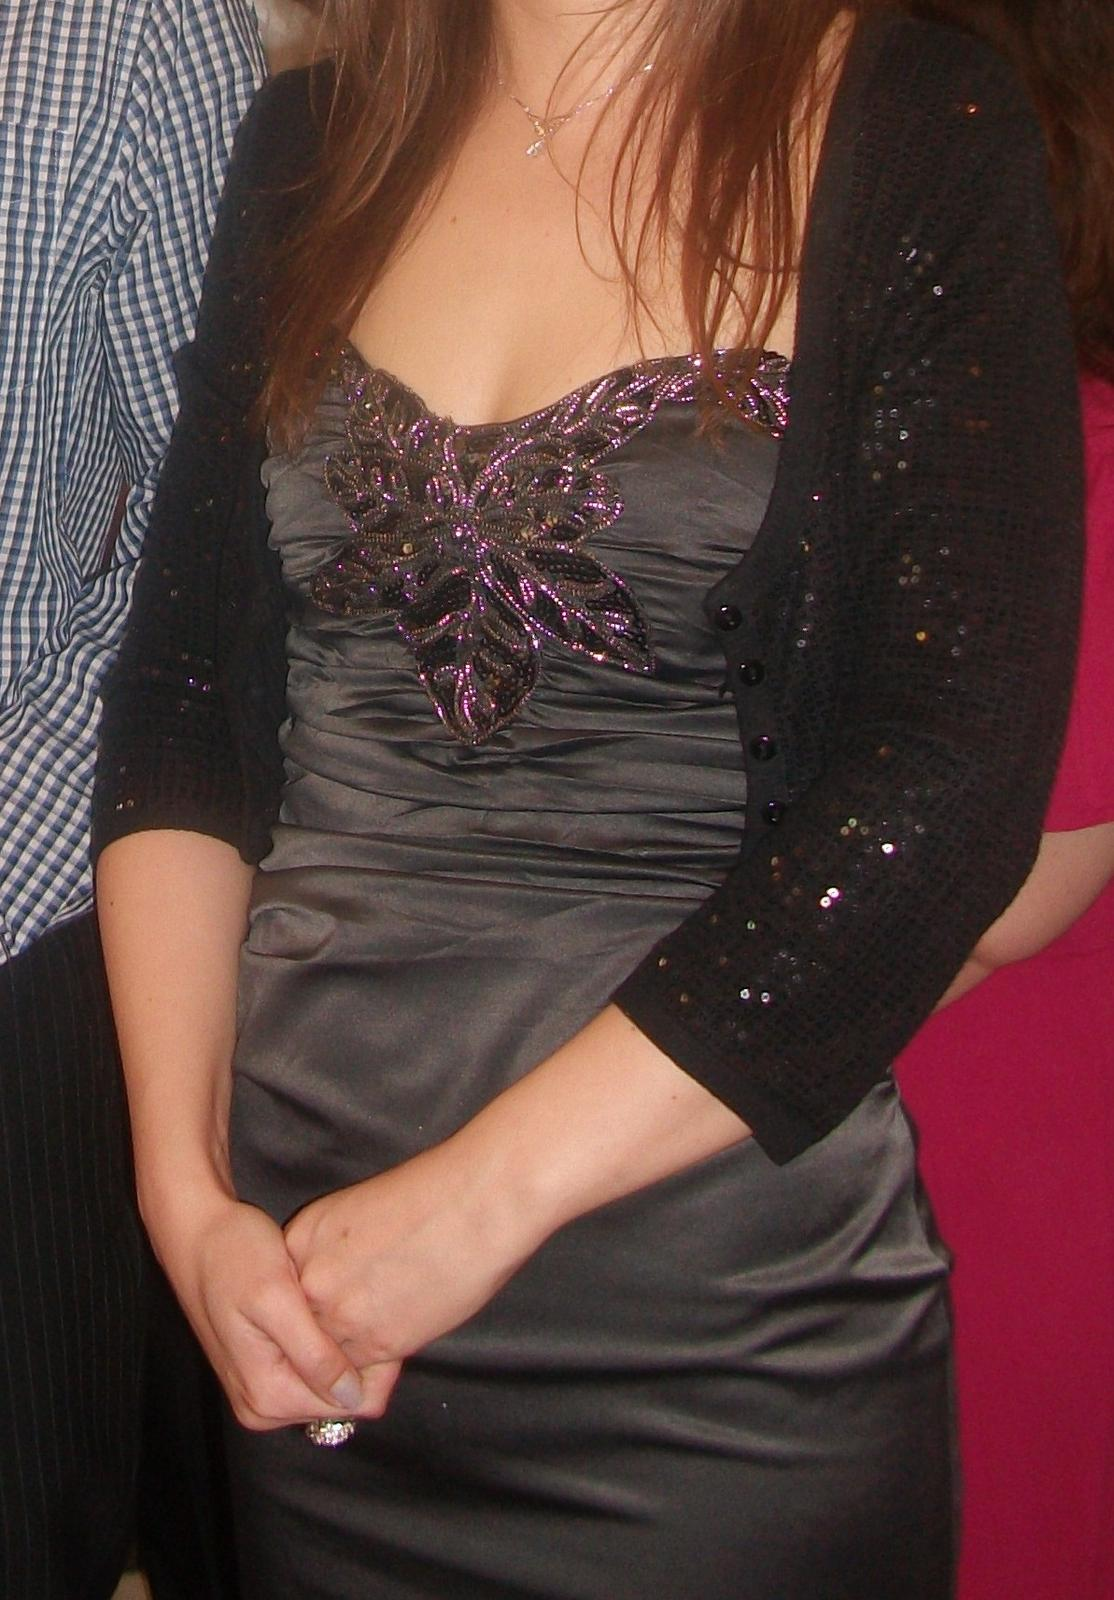 sive šaty - Obrázok č. 1